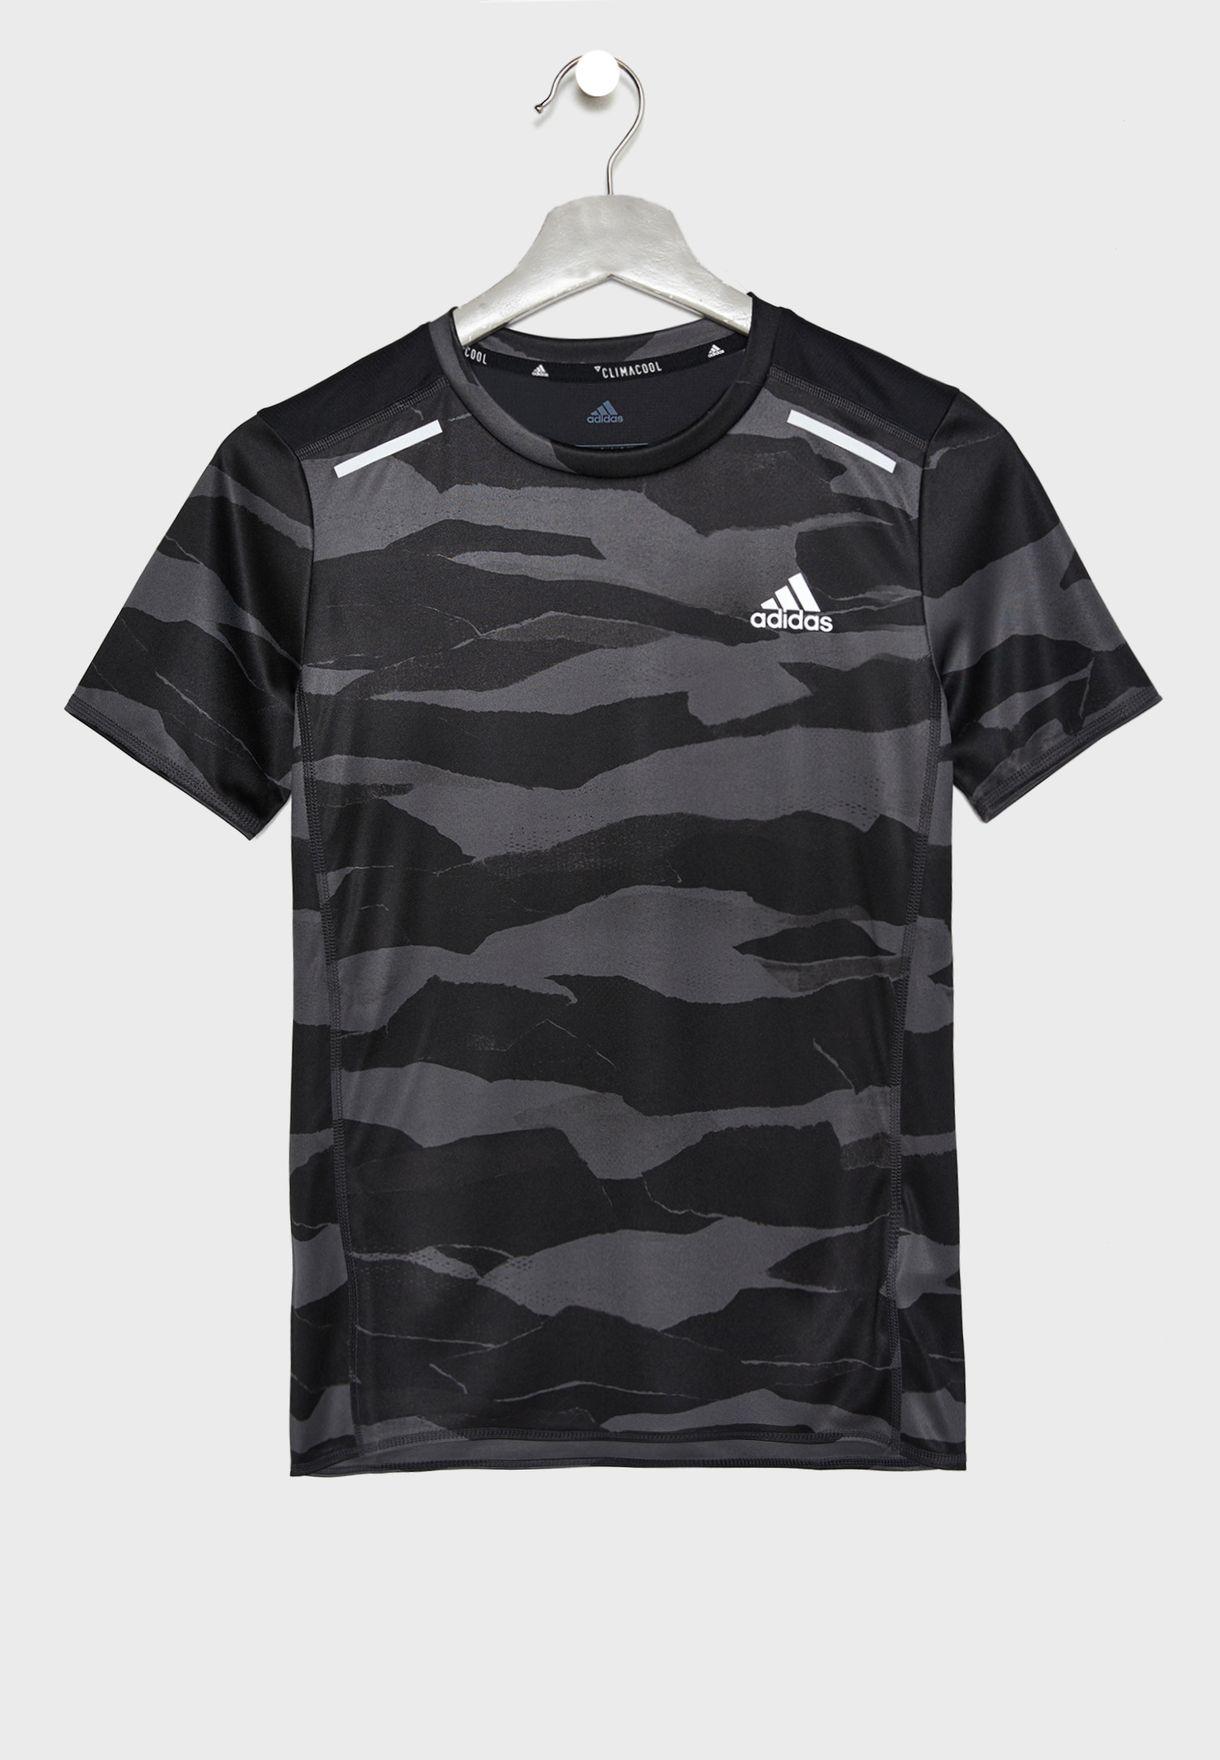 7eb72a0d0 Shop adidas grey Youth Run Camo T-Shirt DV2936 for Kids in UAE ...